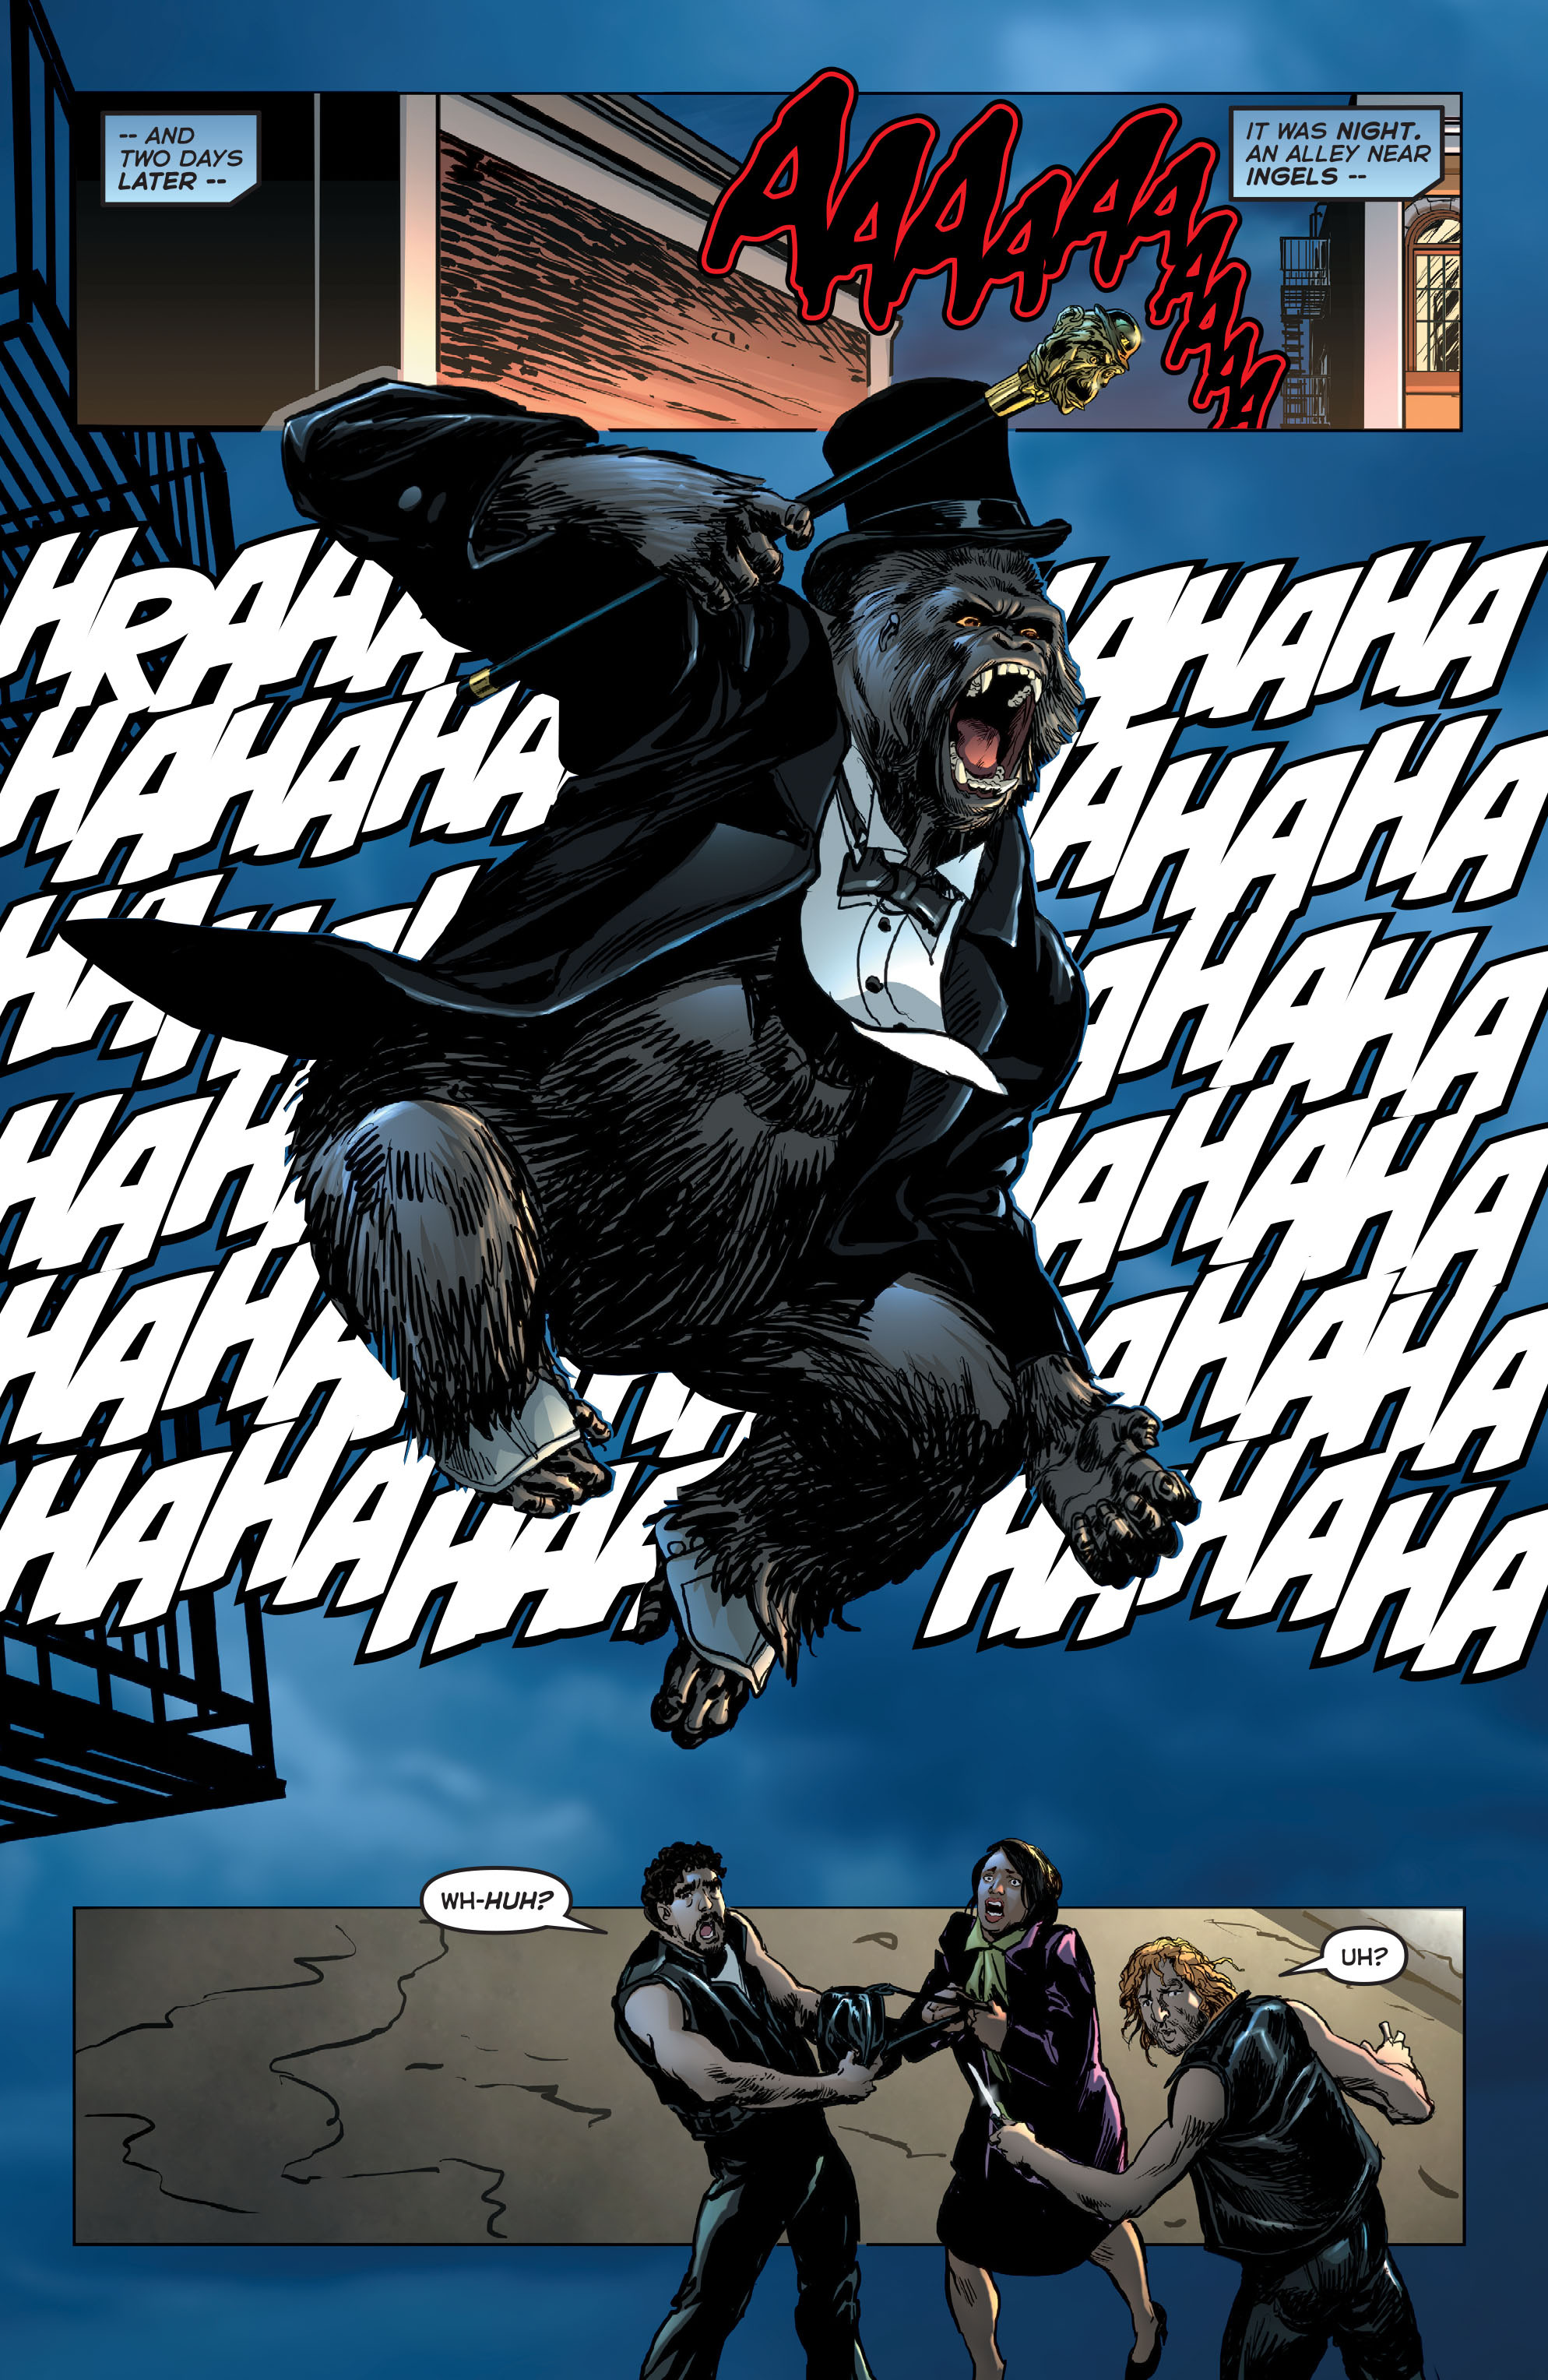 Read online Astro City comic -  Issue #24 - 19